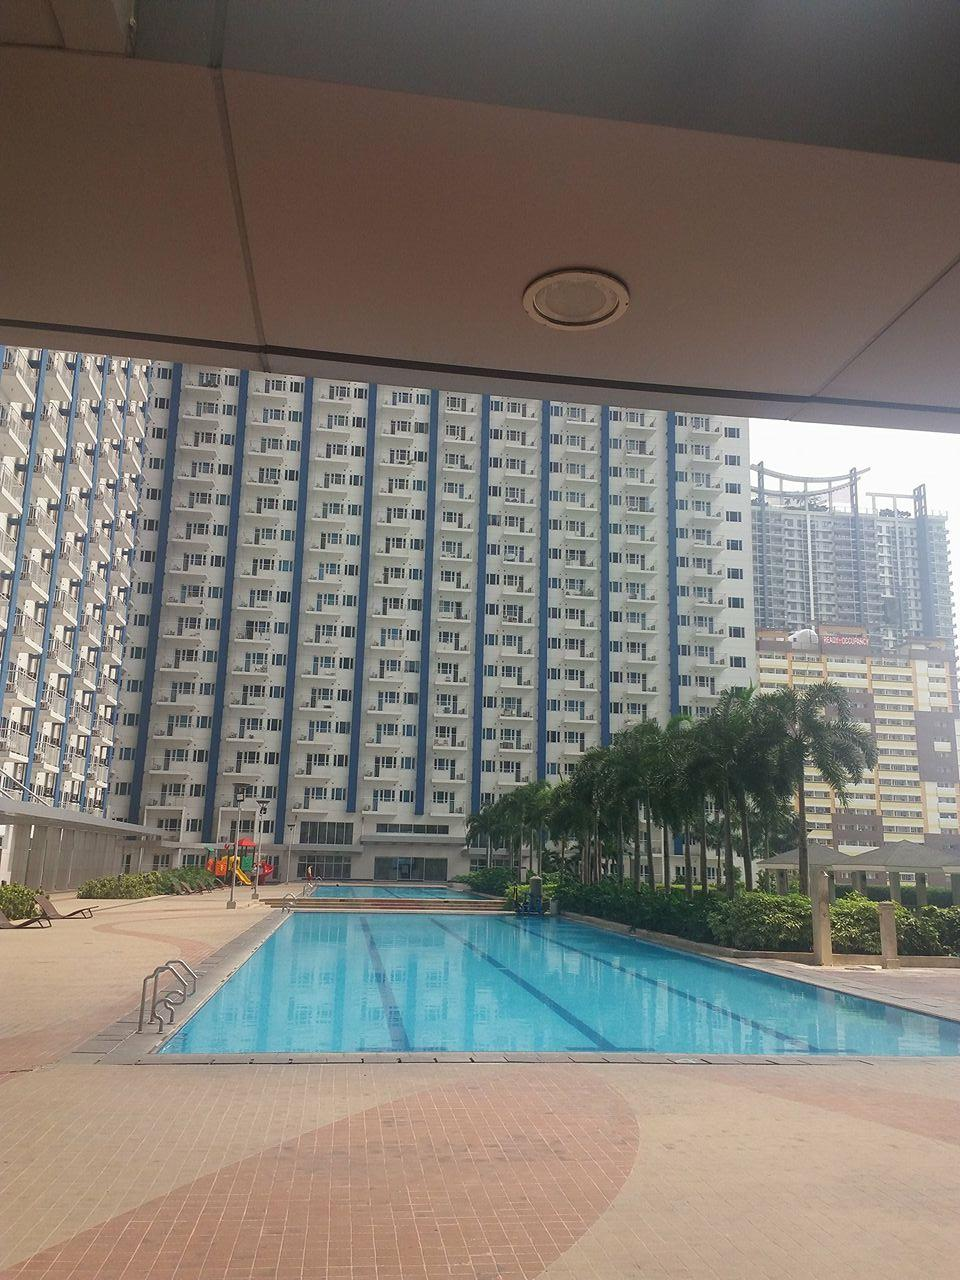 Condominium For Rent in Light Residences, Boni, Mandaluyong, Ncr